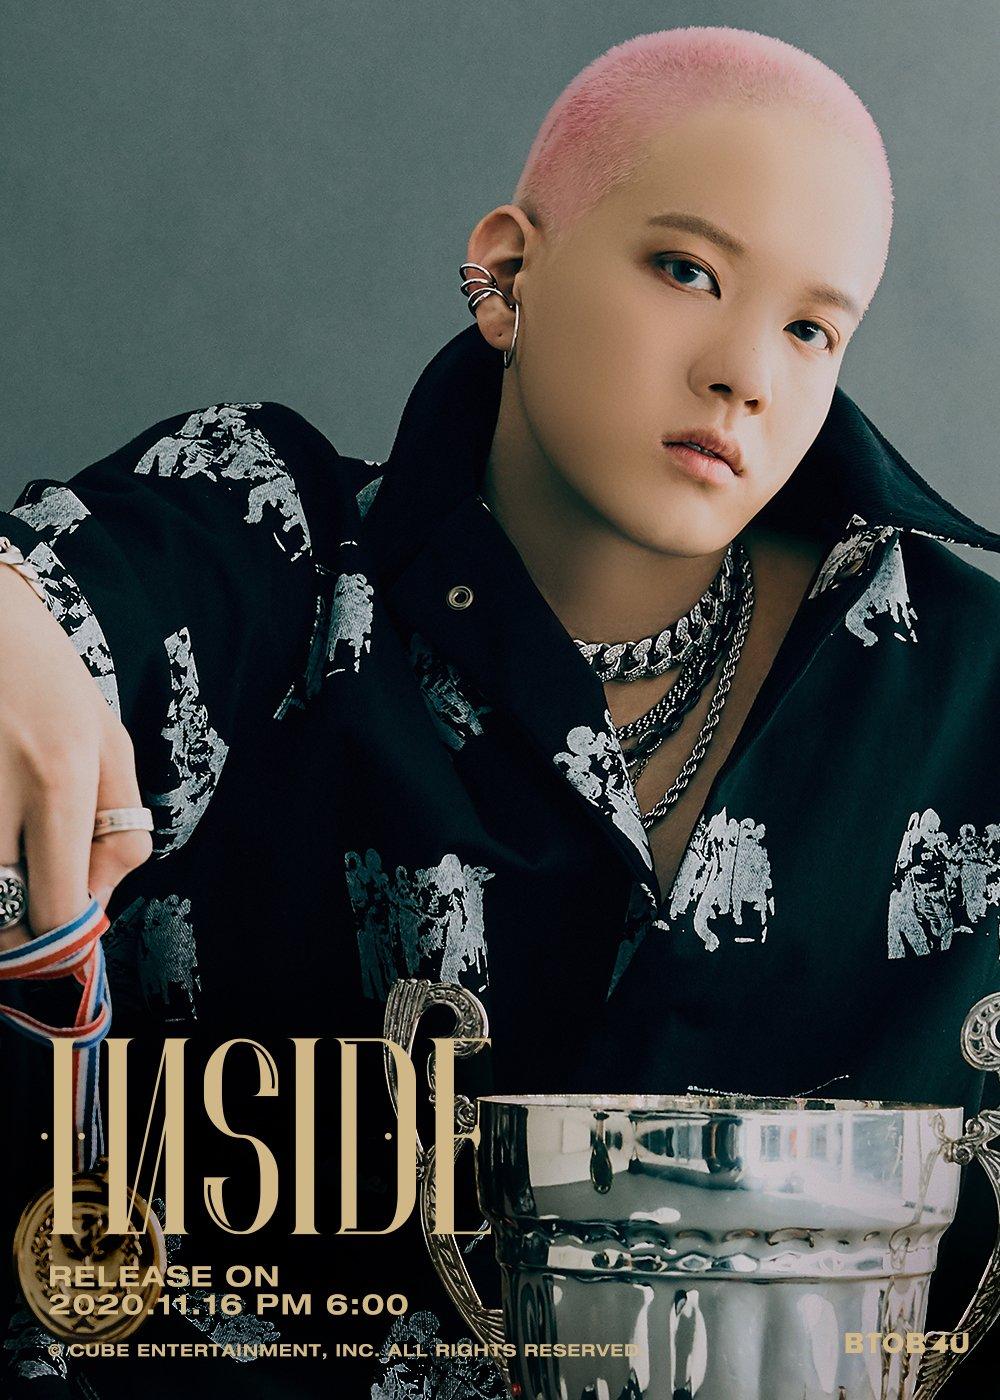 BTOB 4U 1st Mini Album Image Teaser - Peniel